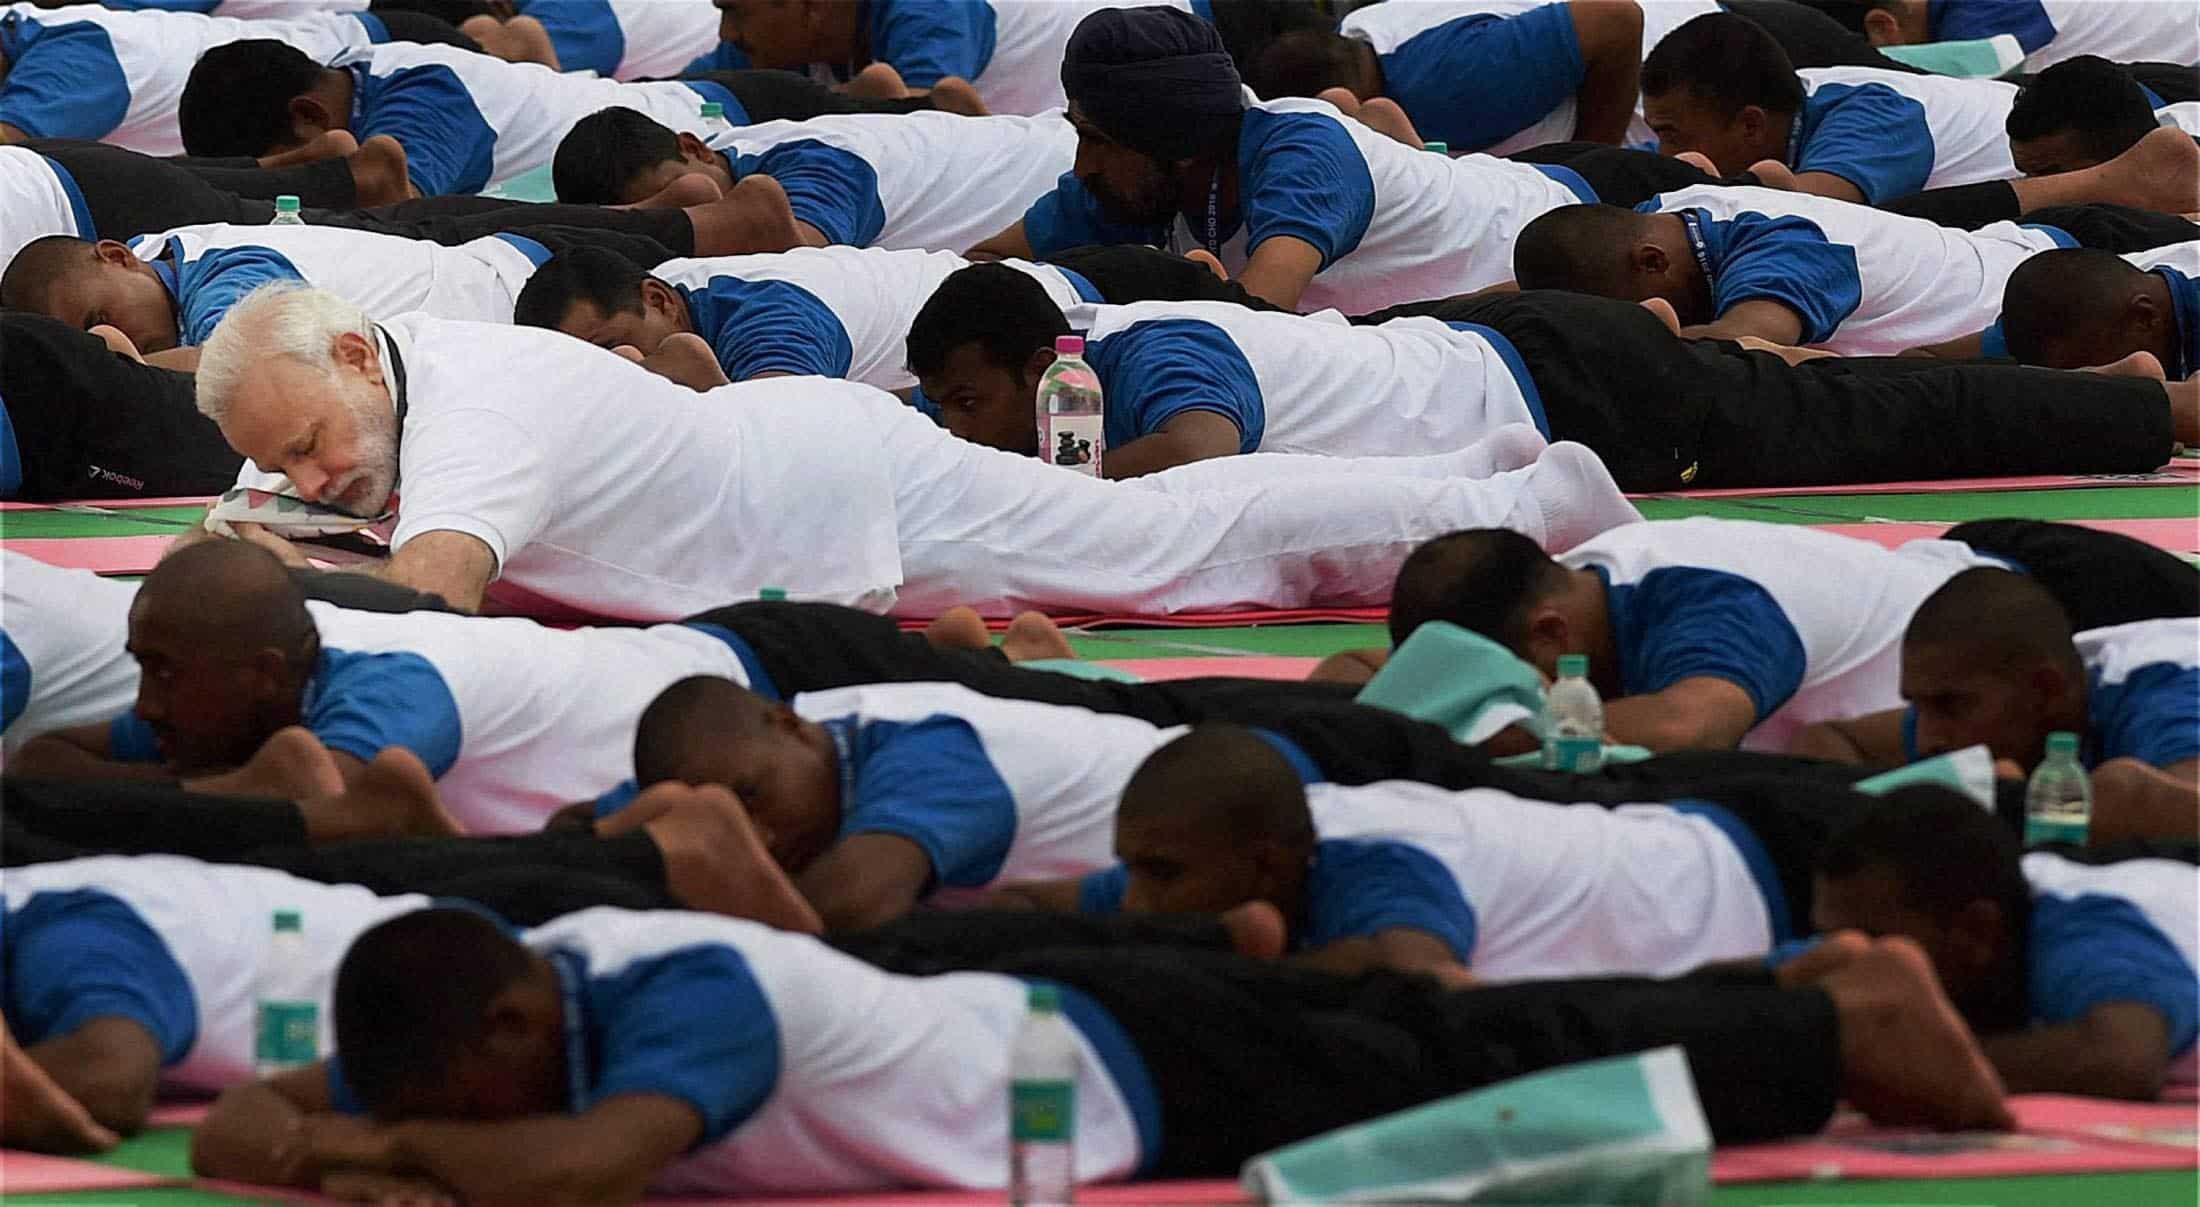 Prime Minister Narendra Modi, laid down his yoga mat among thousand others and practiced yoga. PTI